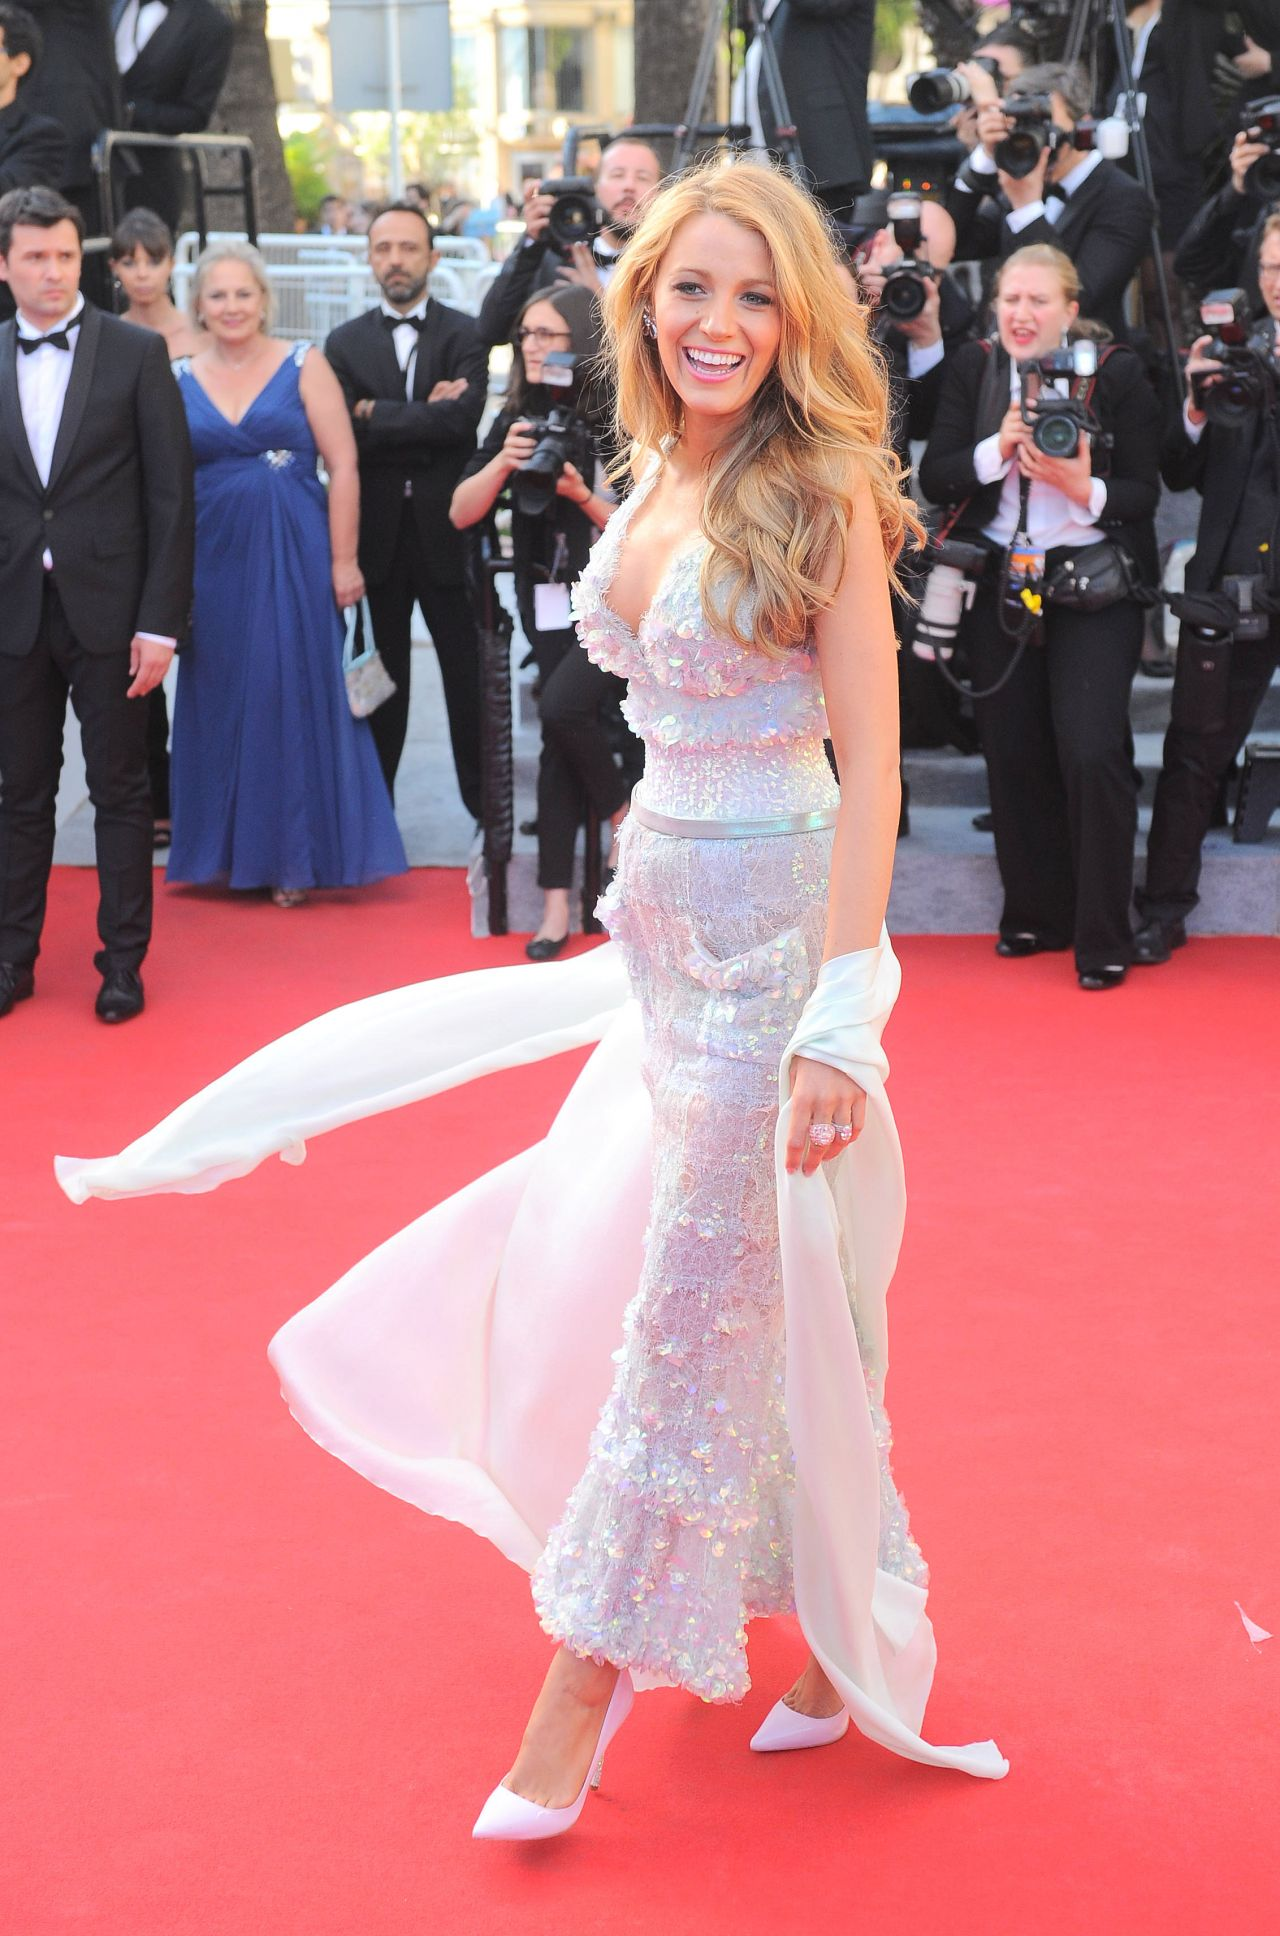 MR. TURNER Premiere at 2014 Cannes Film Festival - Blake Lively on Red Carpet